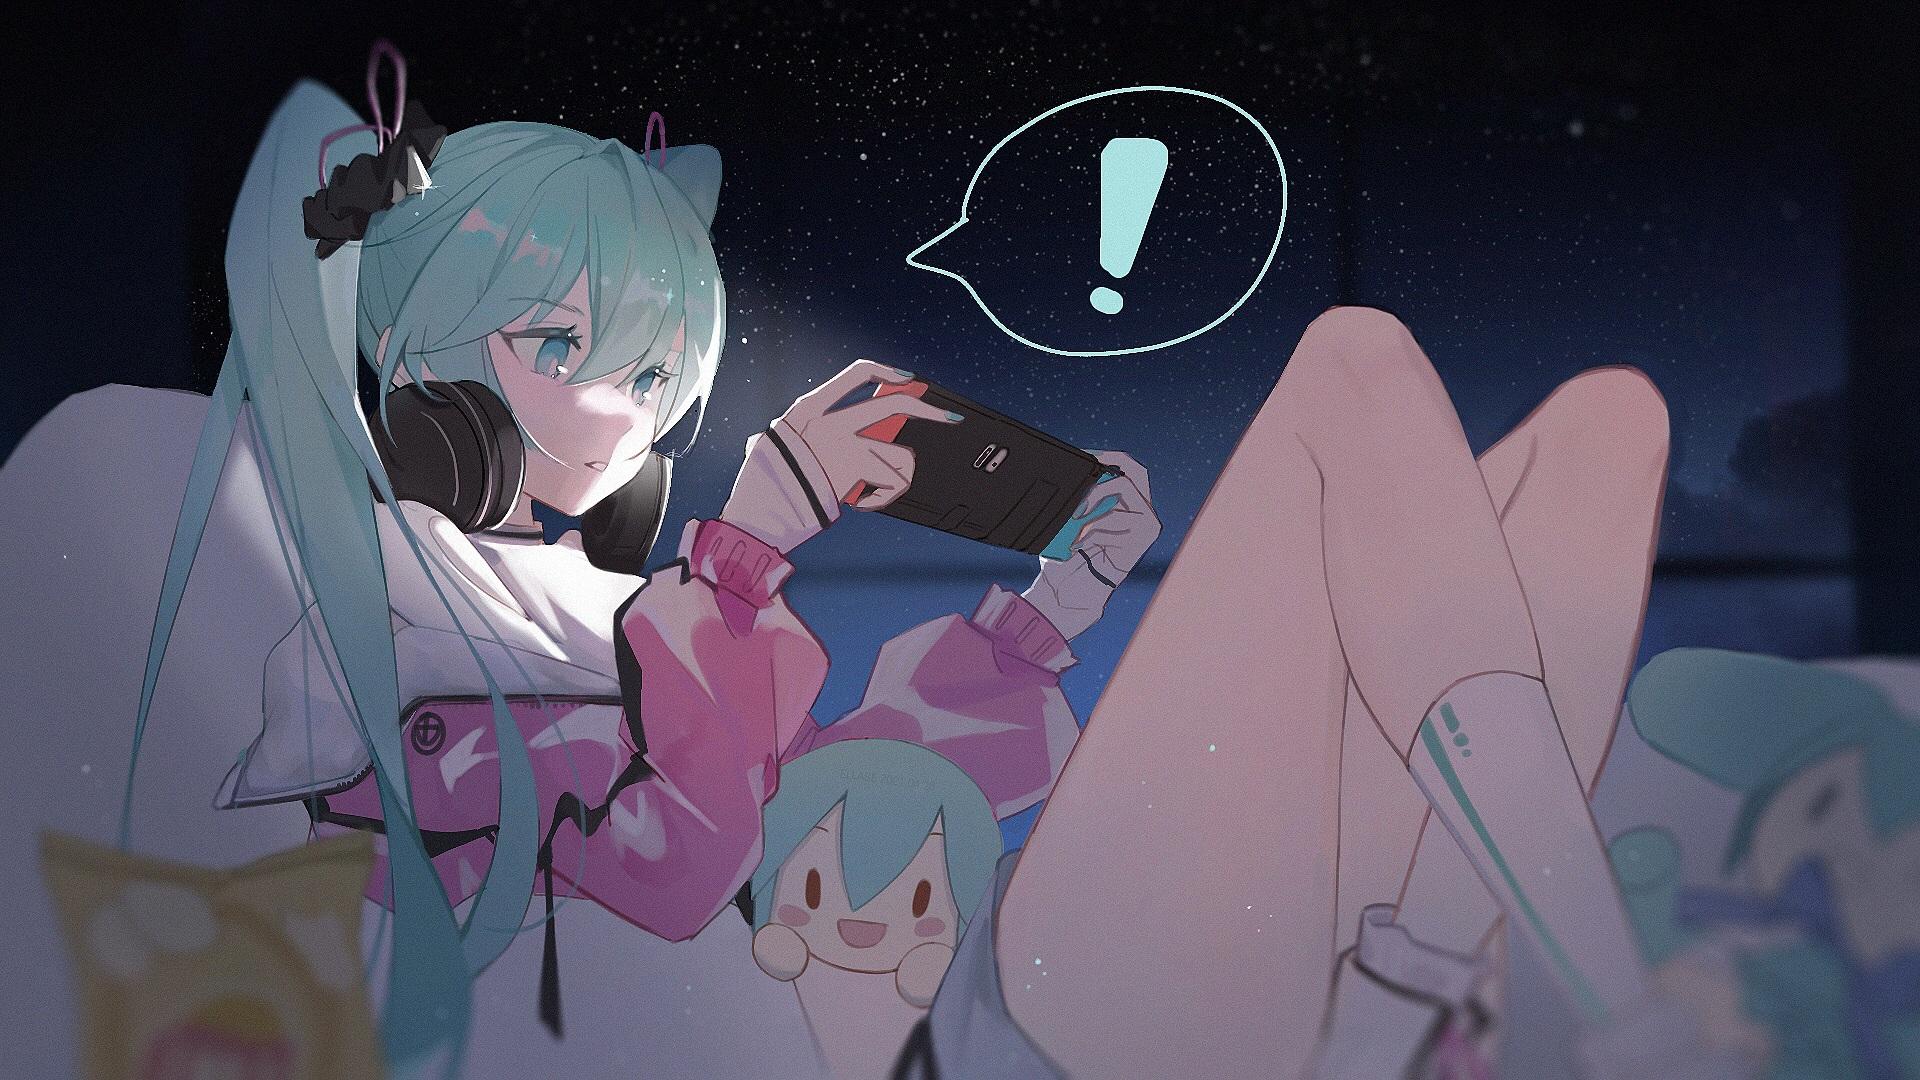 Anime 1920x1080 anime anime girls Hatsune Miku Nintendo Switch